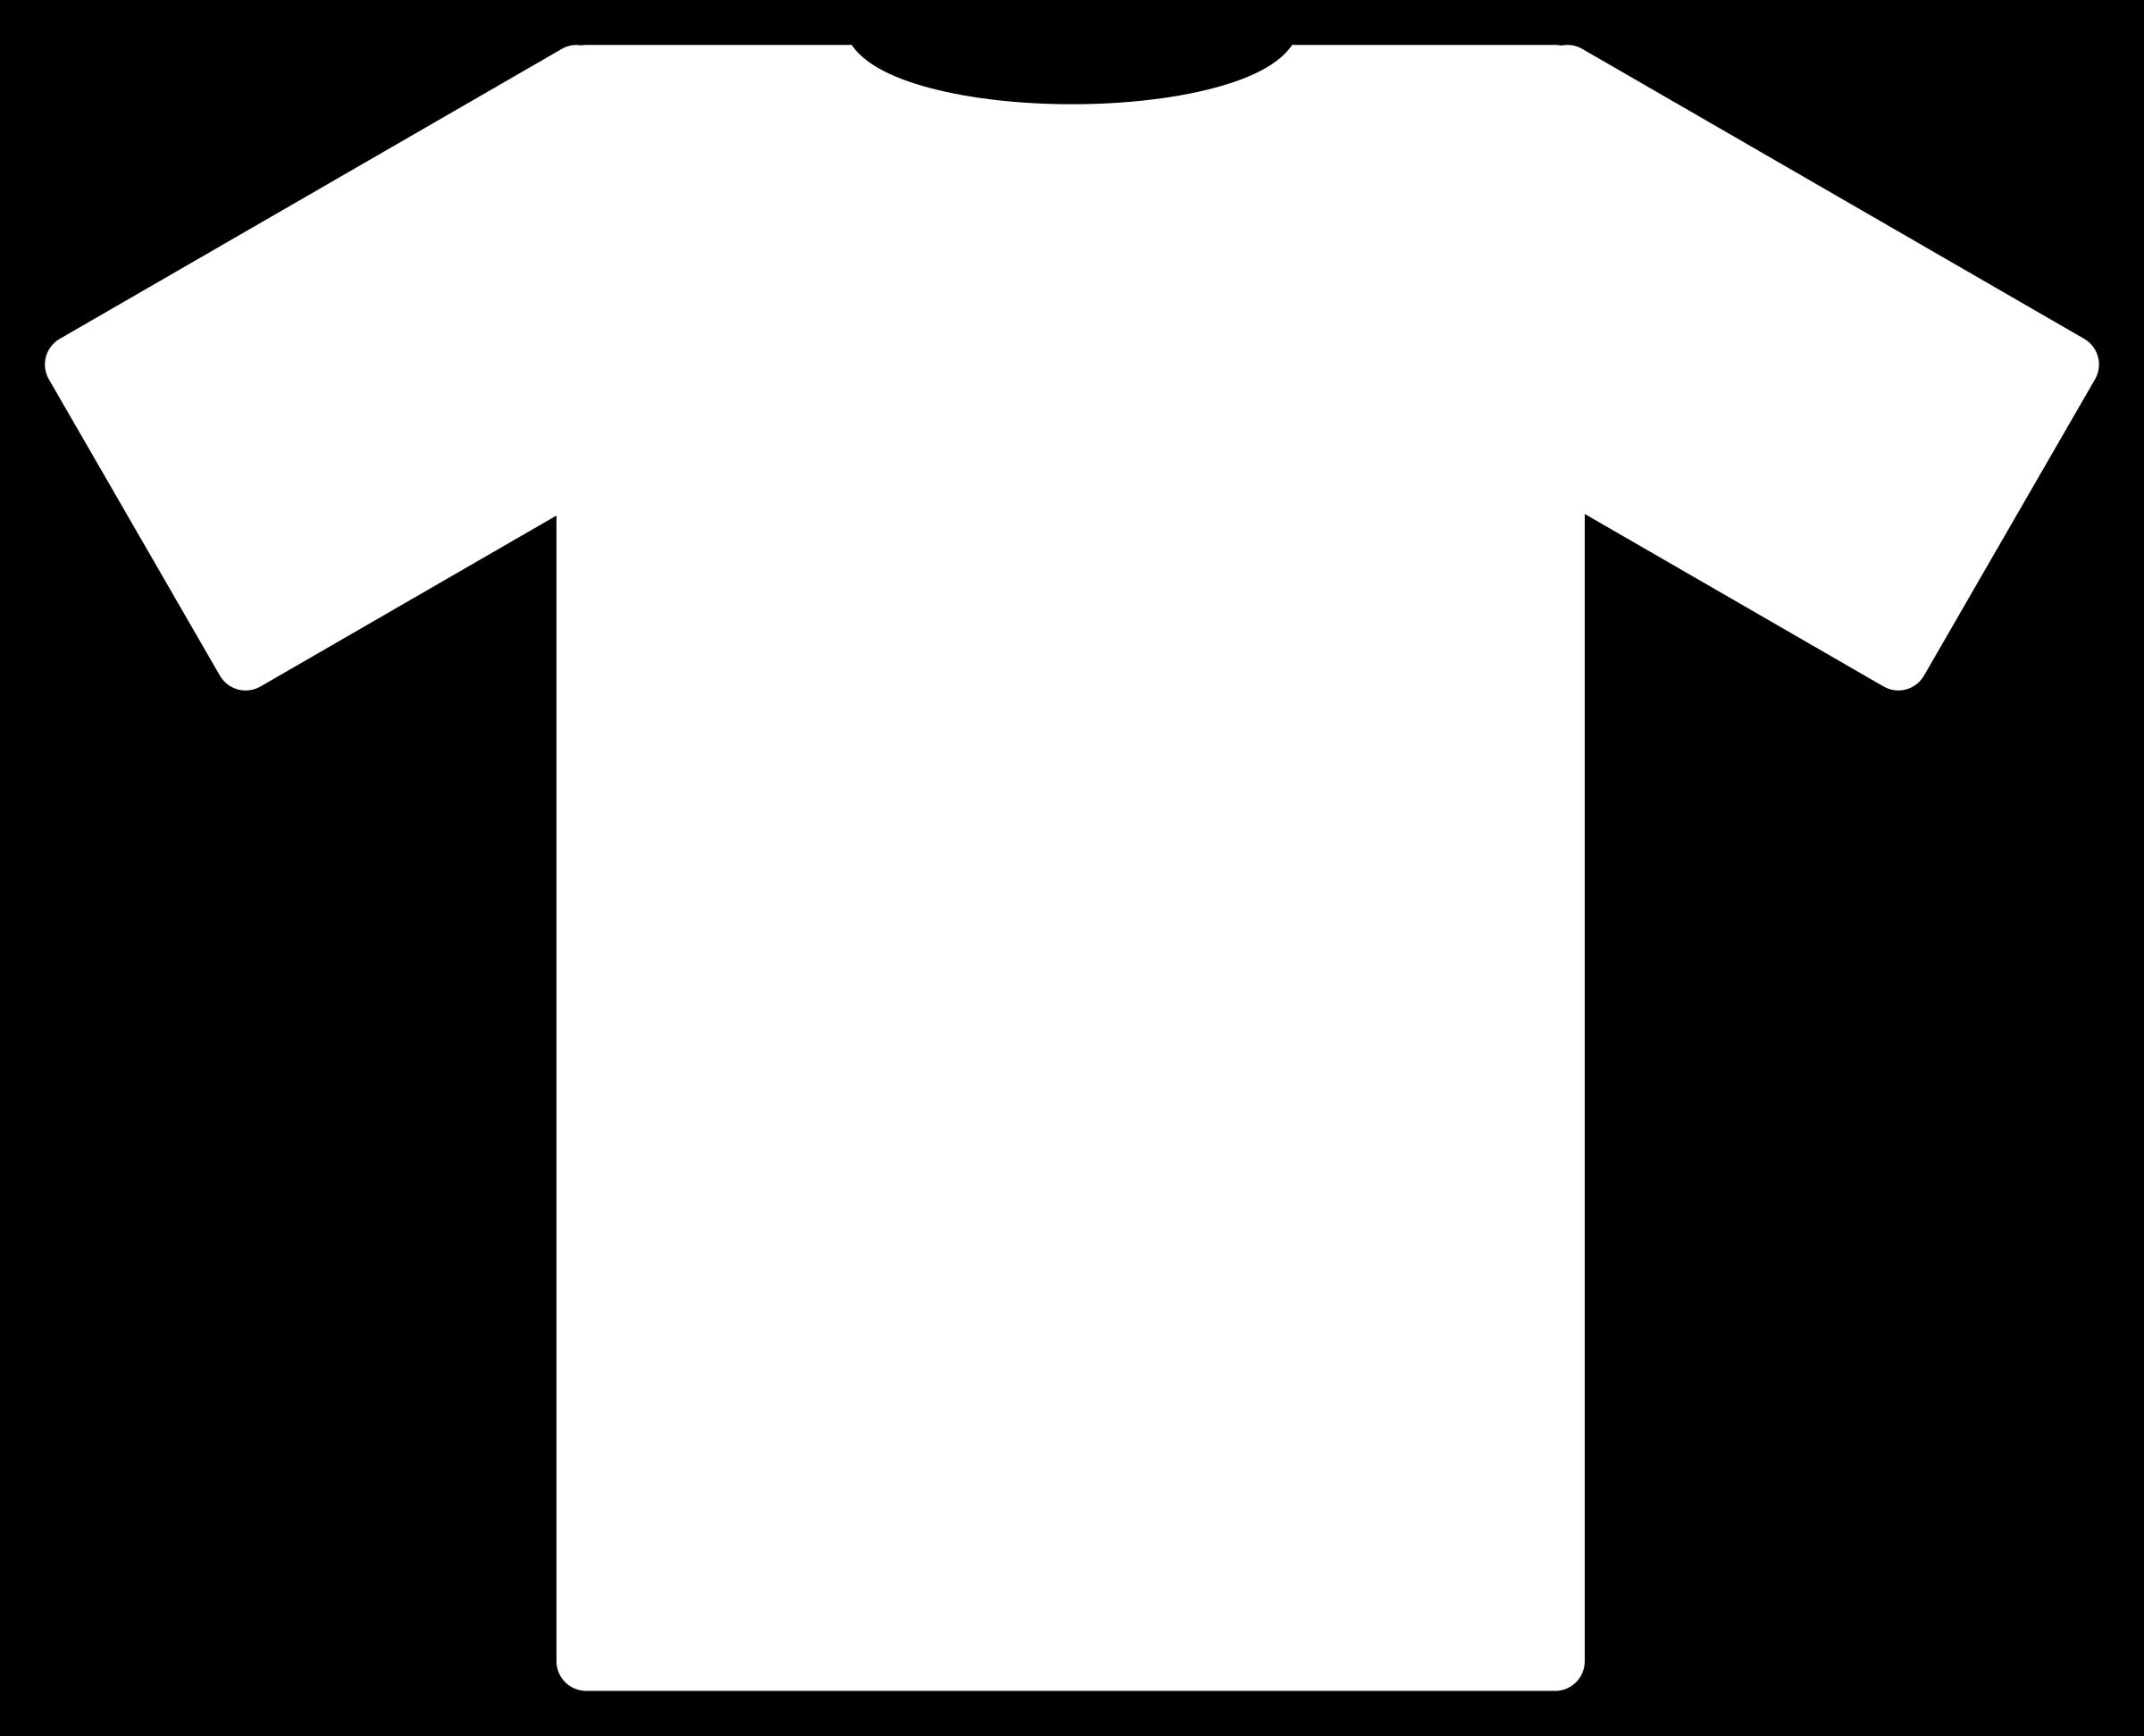 Clipart shirt silhouette. White t big image